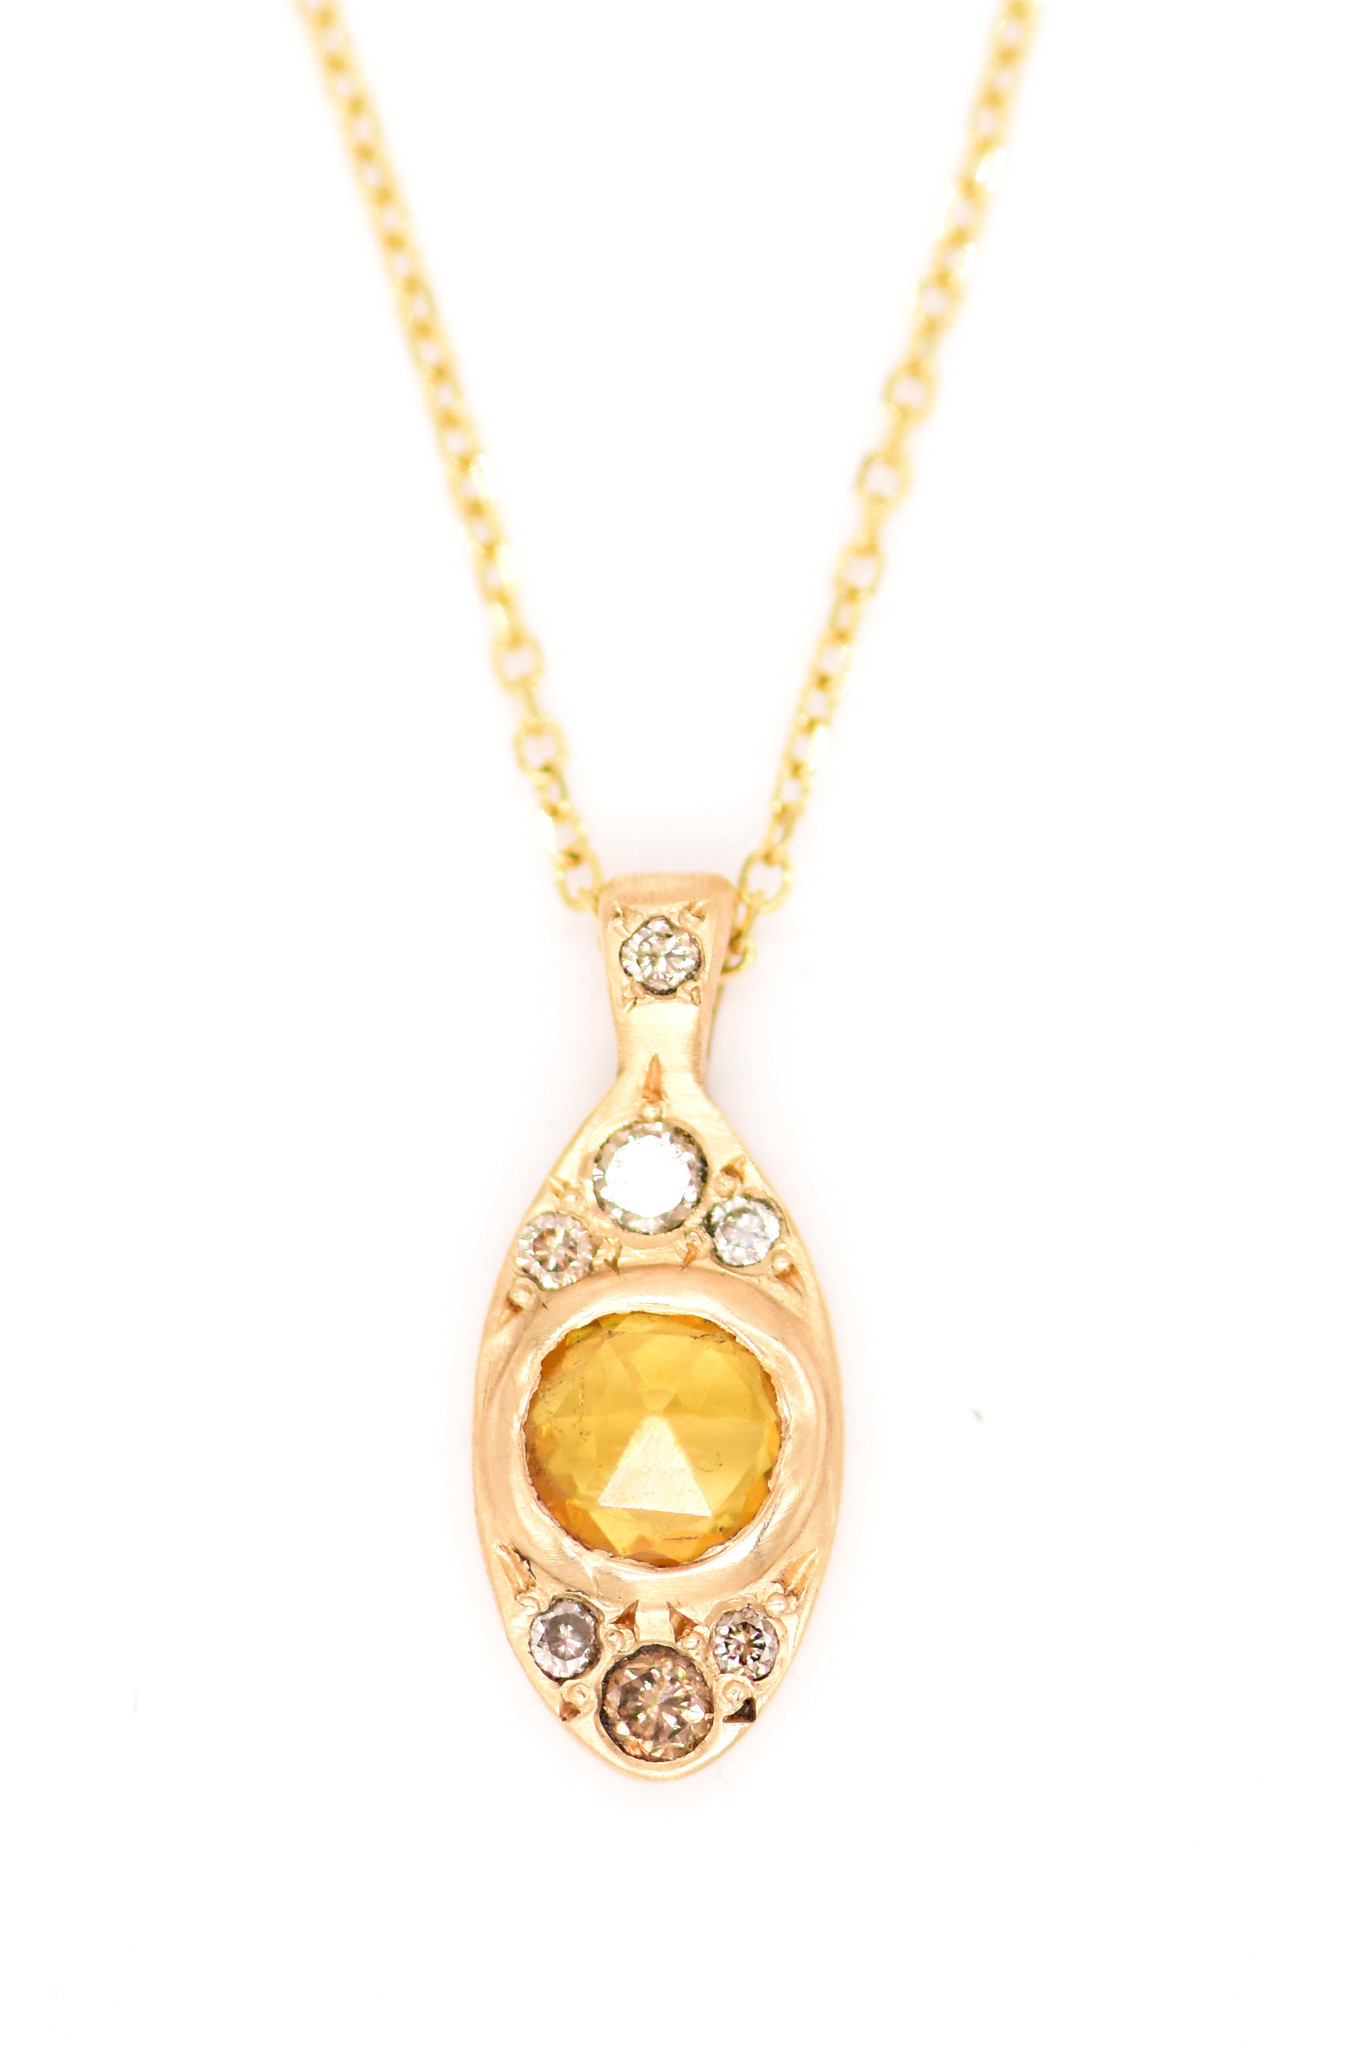 Lorak Winged Rose Necklace